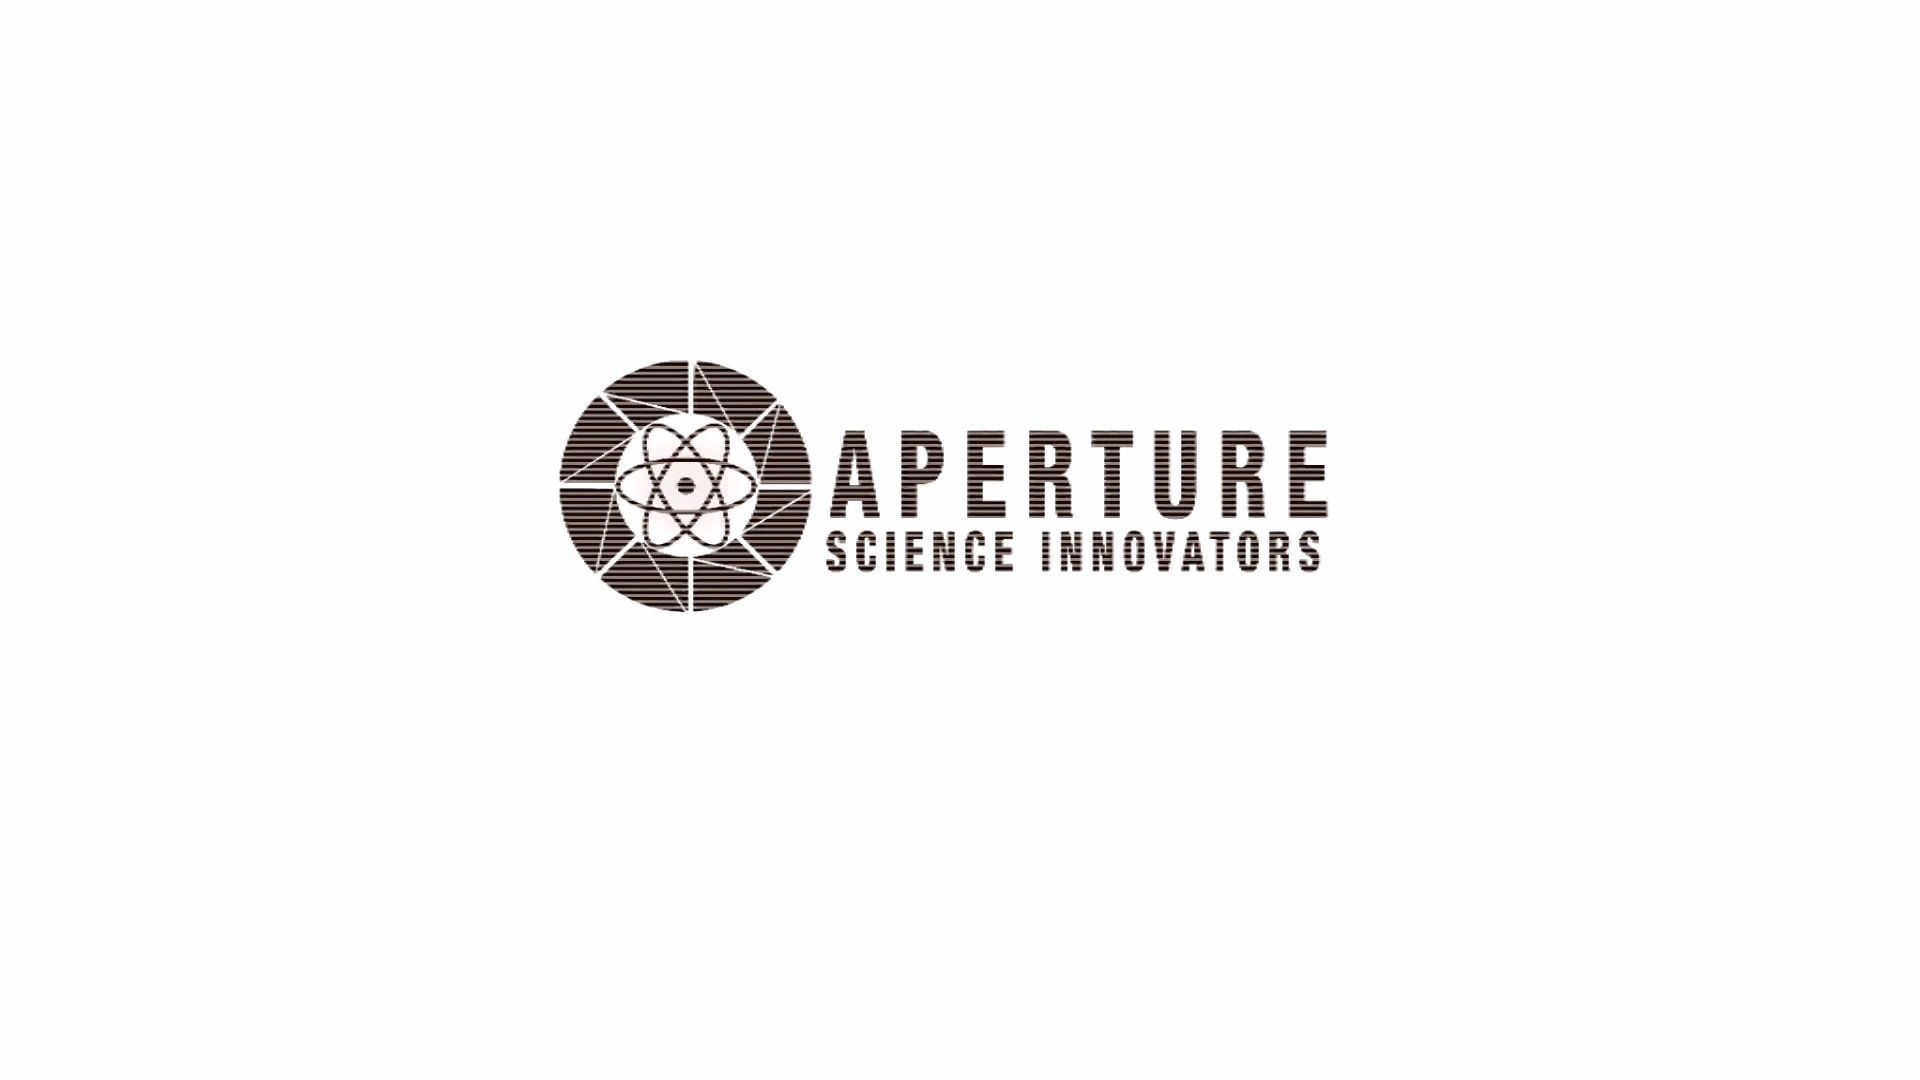 portal aperture laboratories portal 2 wallpaper   1920x1080   297377